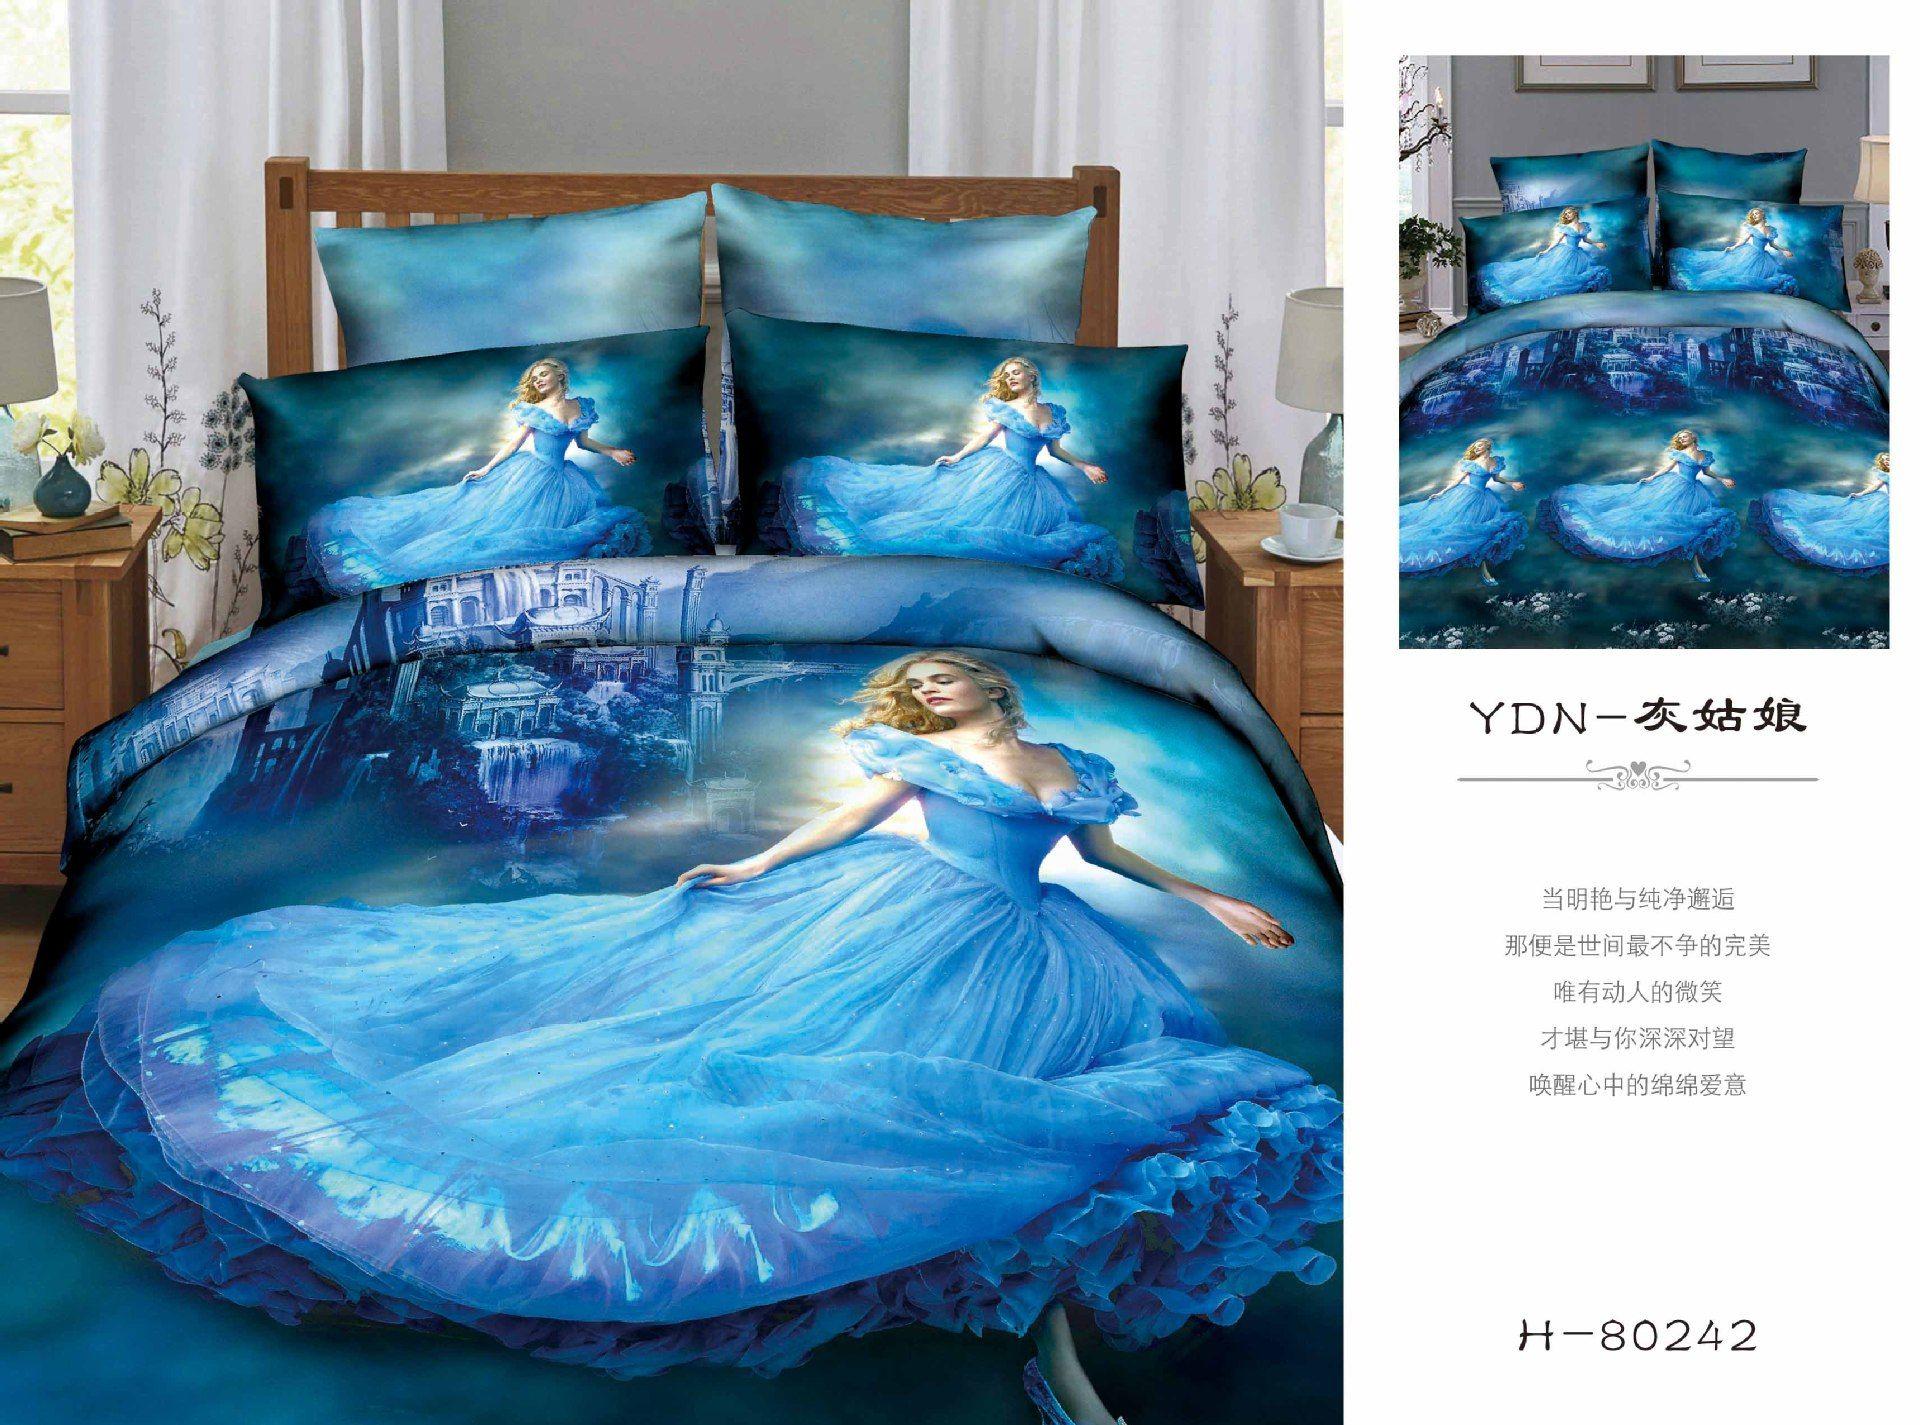 online cheap 3d cinderella bedding set bedding sets elsa anna